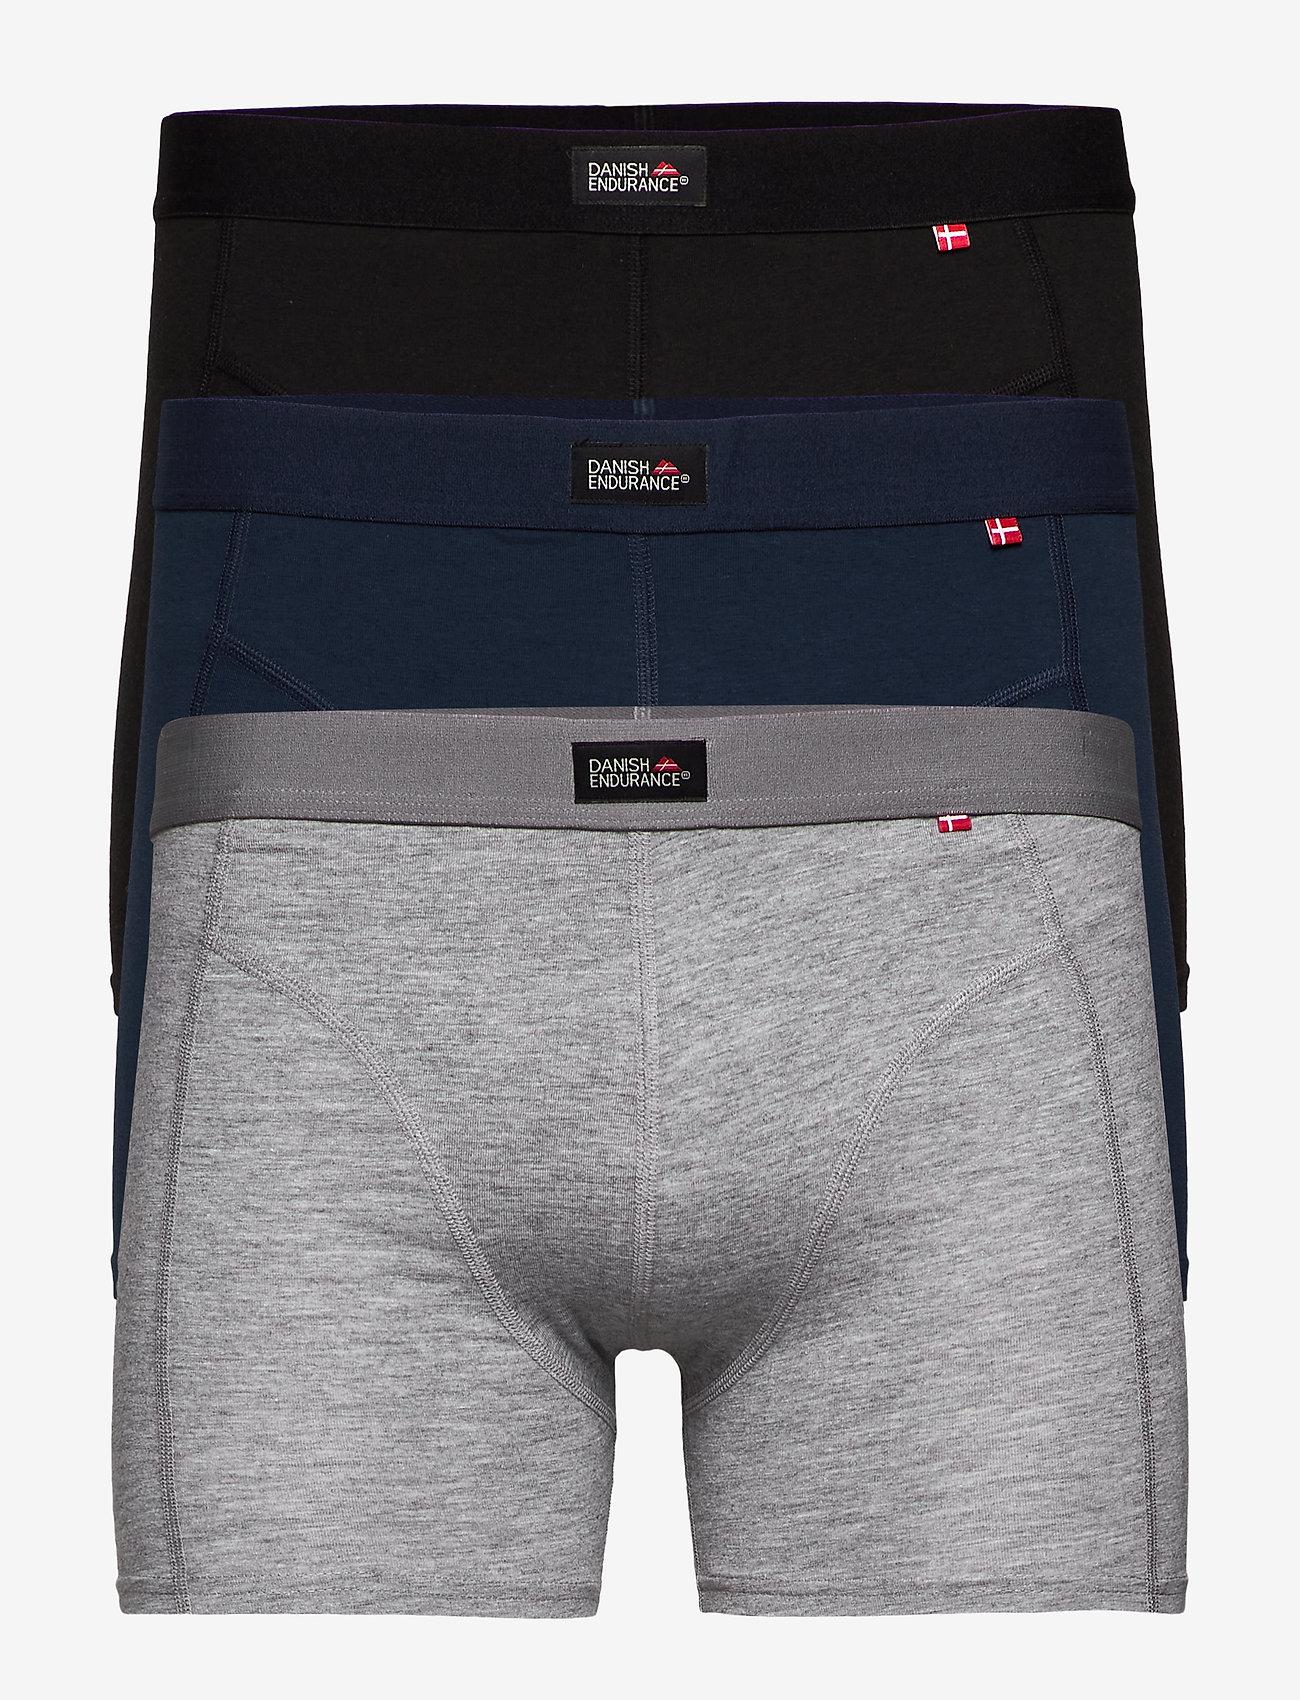 Danish Endurance - Classic Trunks 3 Pack - ondergoed - multicolour (black, navy blue, grey) - 0